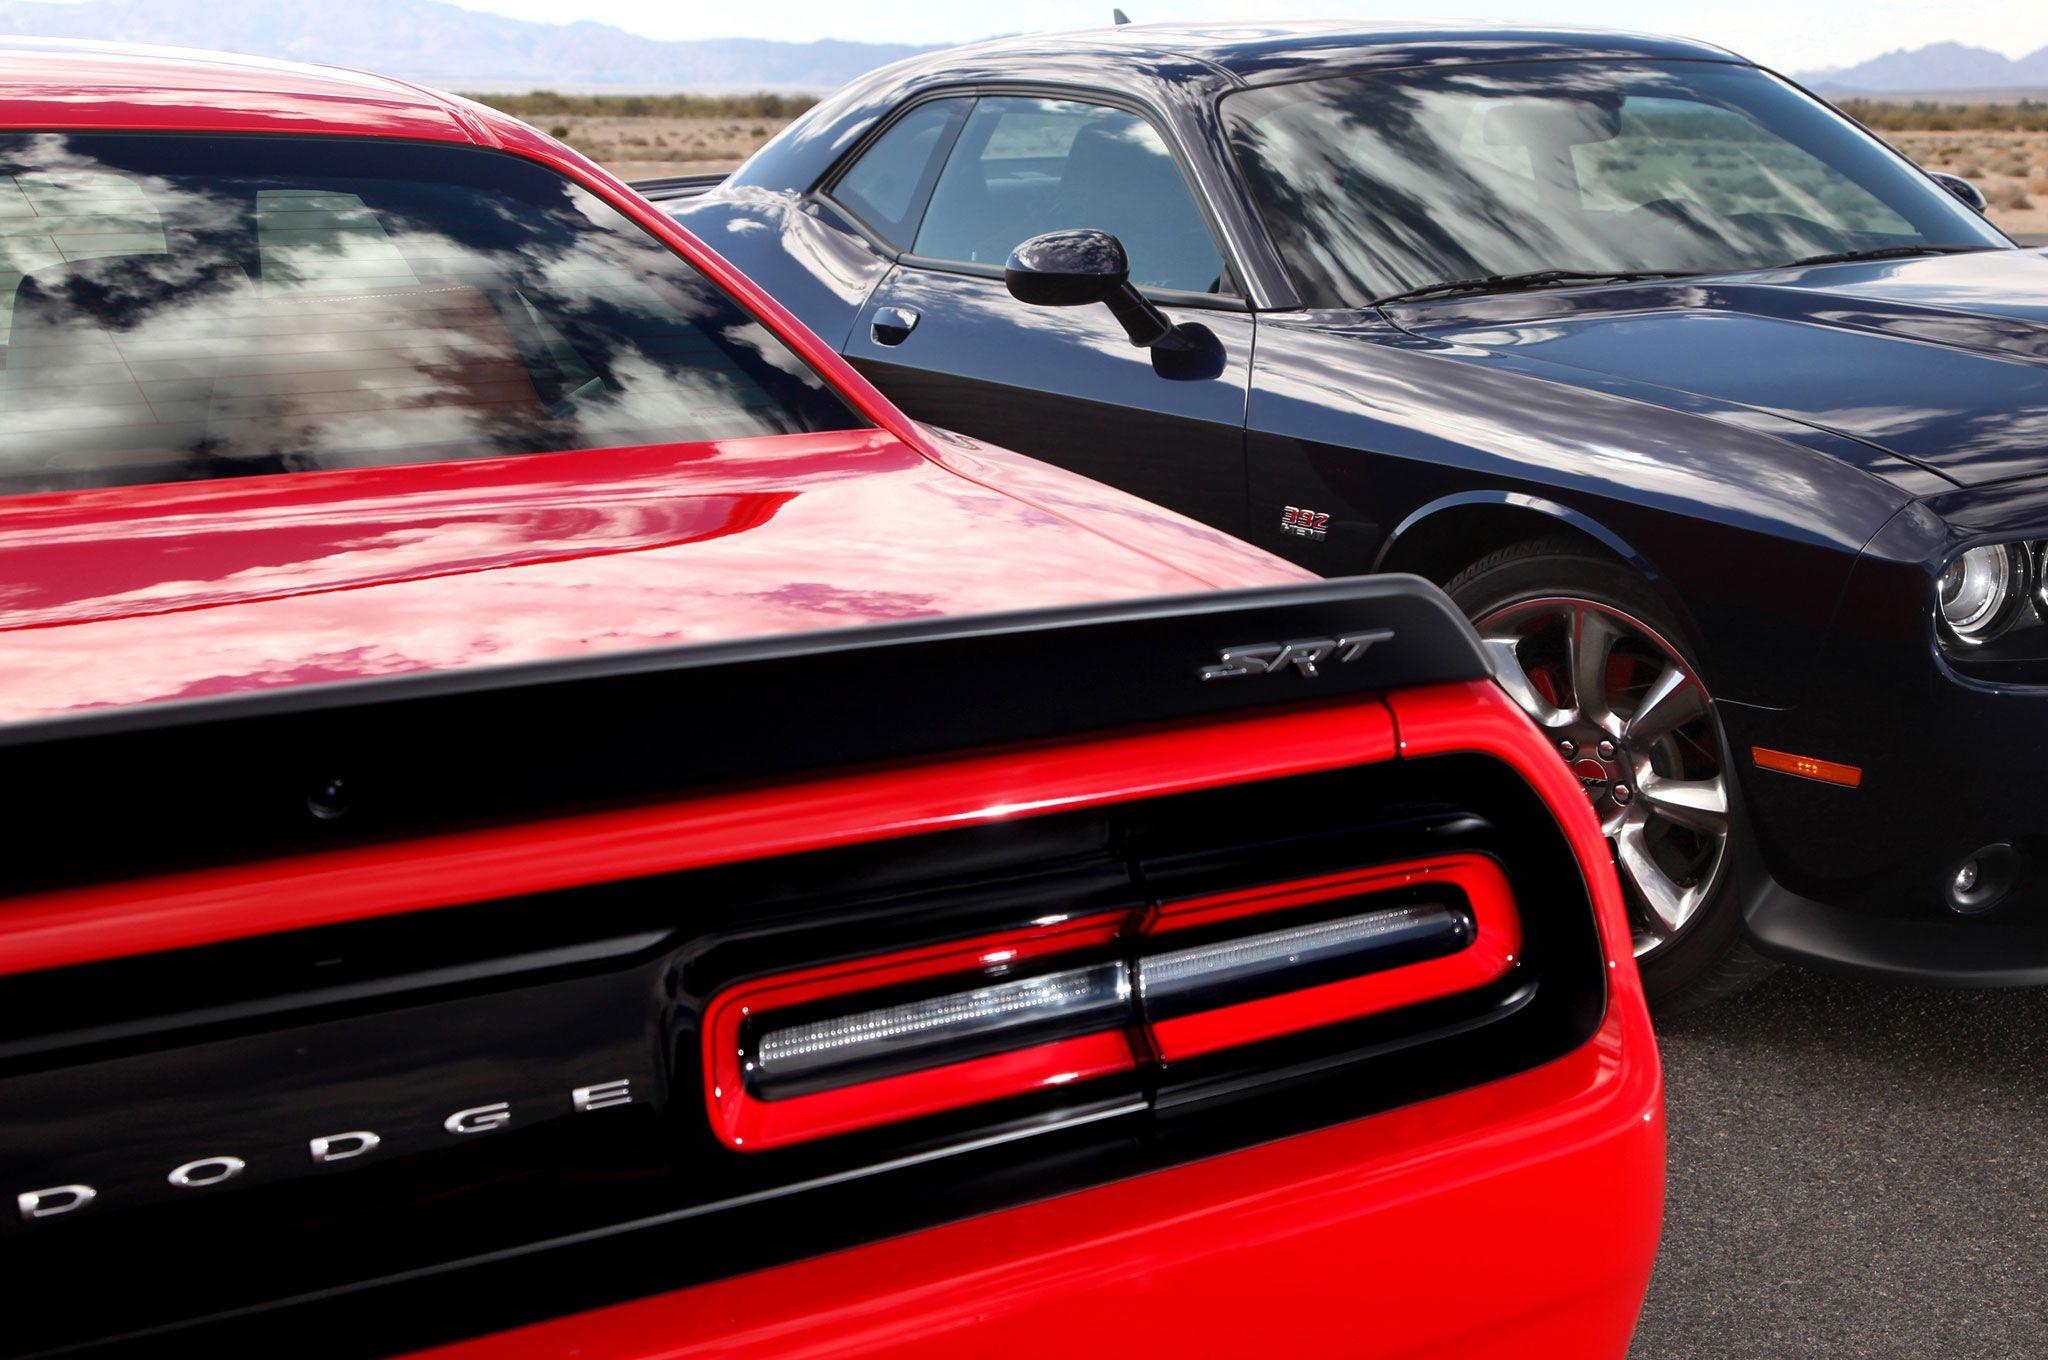 Dodge challenger hellcat 2015 dodge challenger srt hellcat tyred pinterest challenger srt hellcat photos and trends